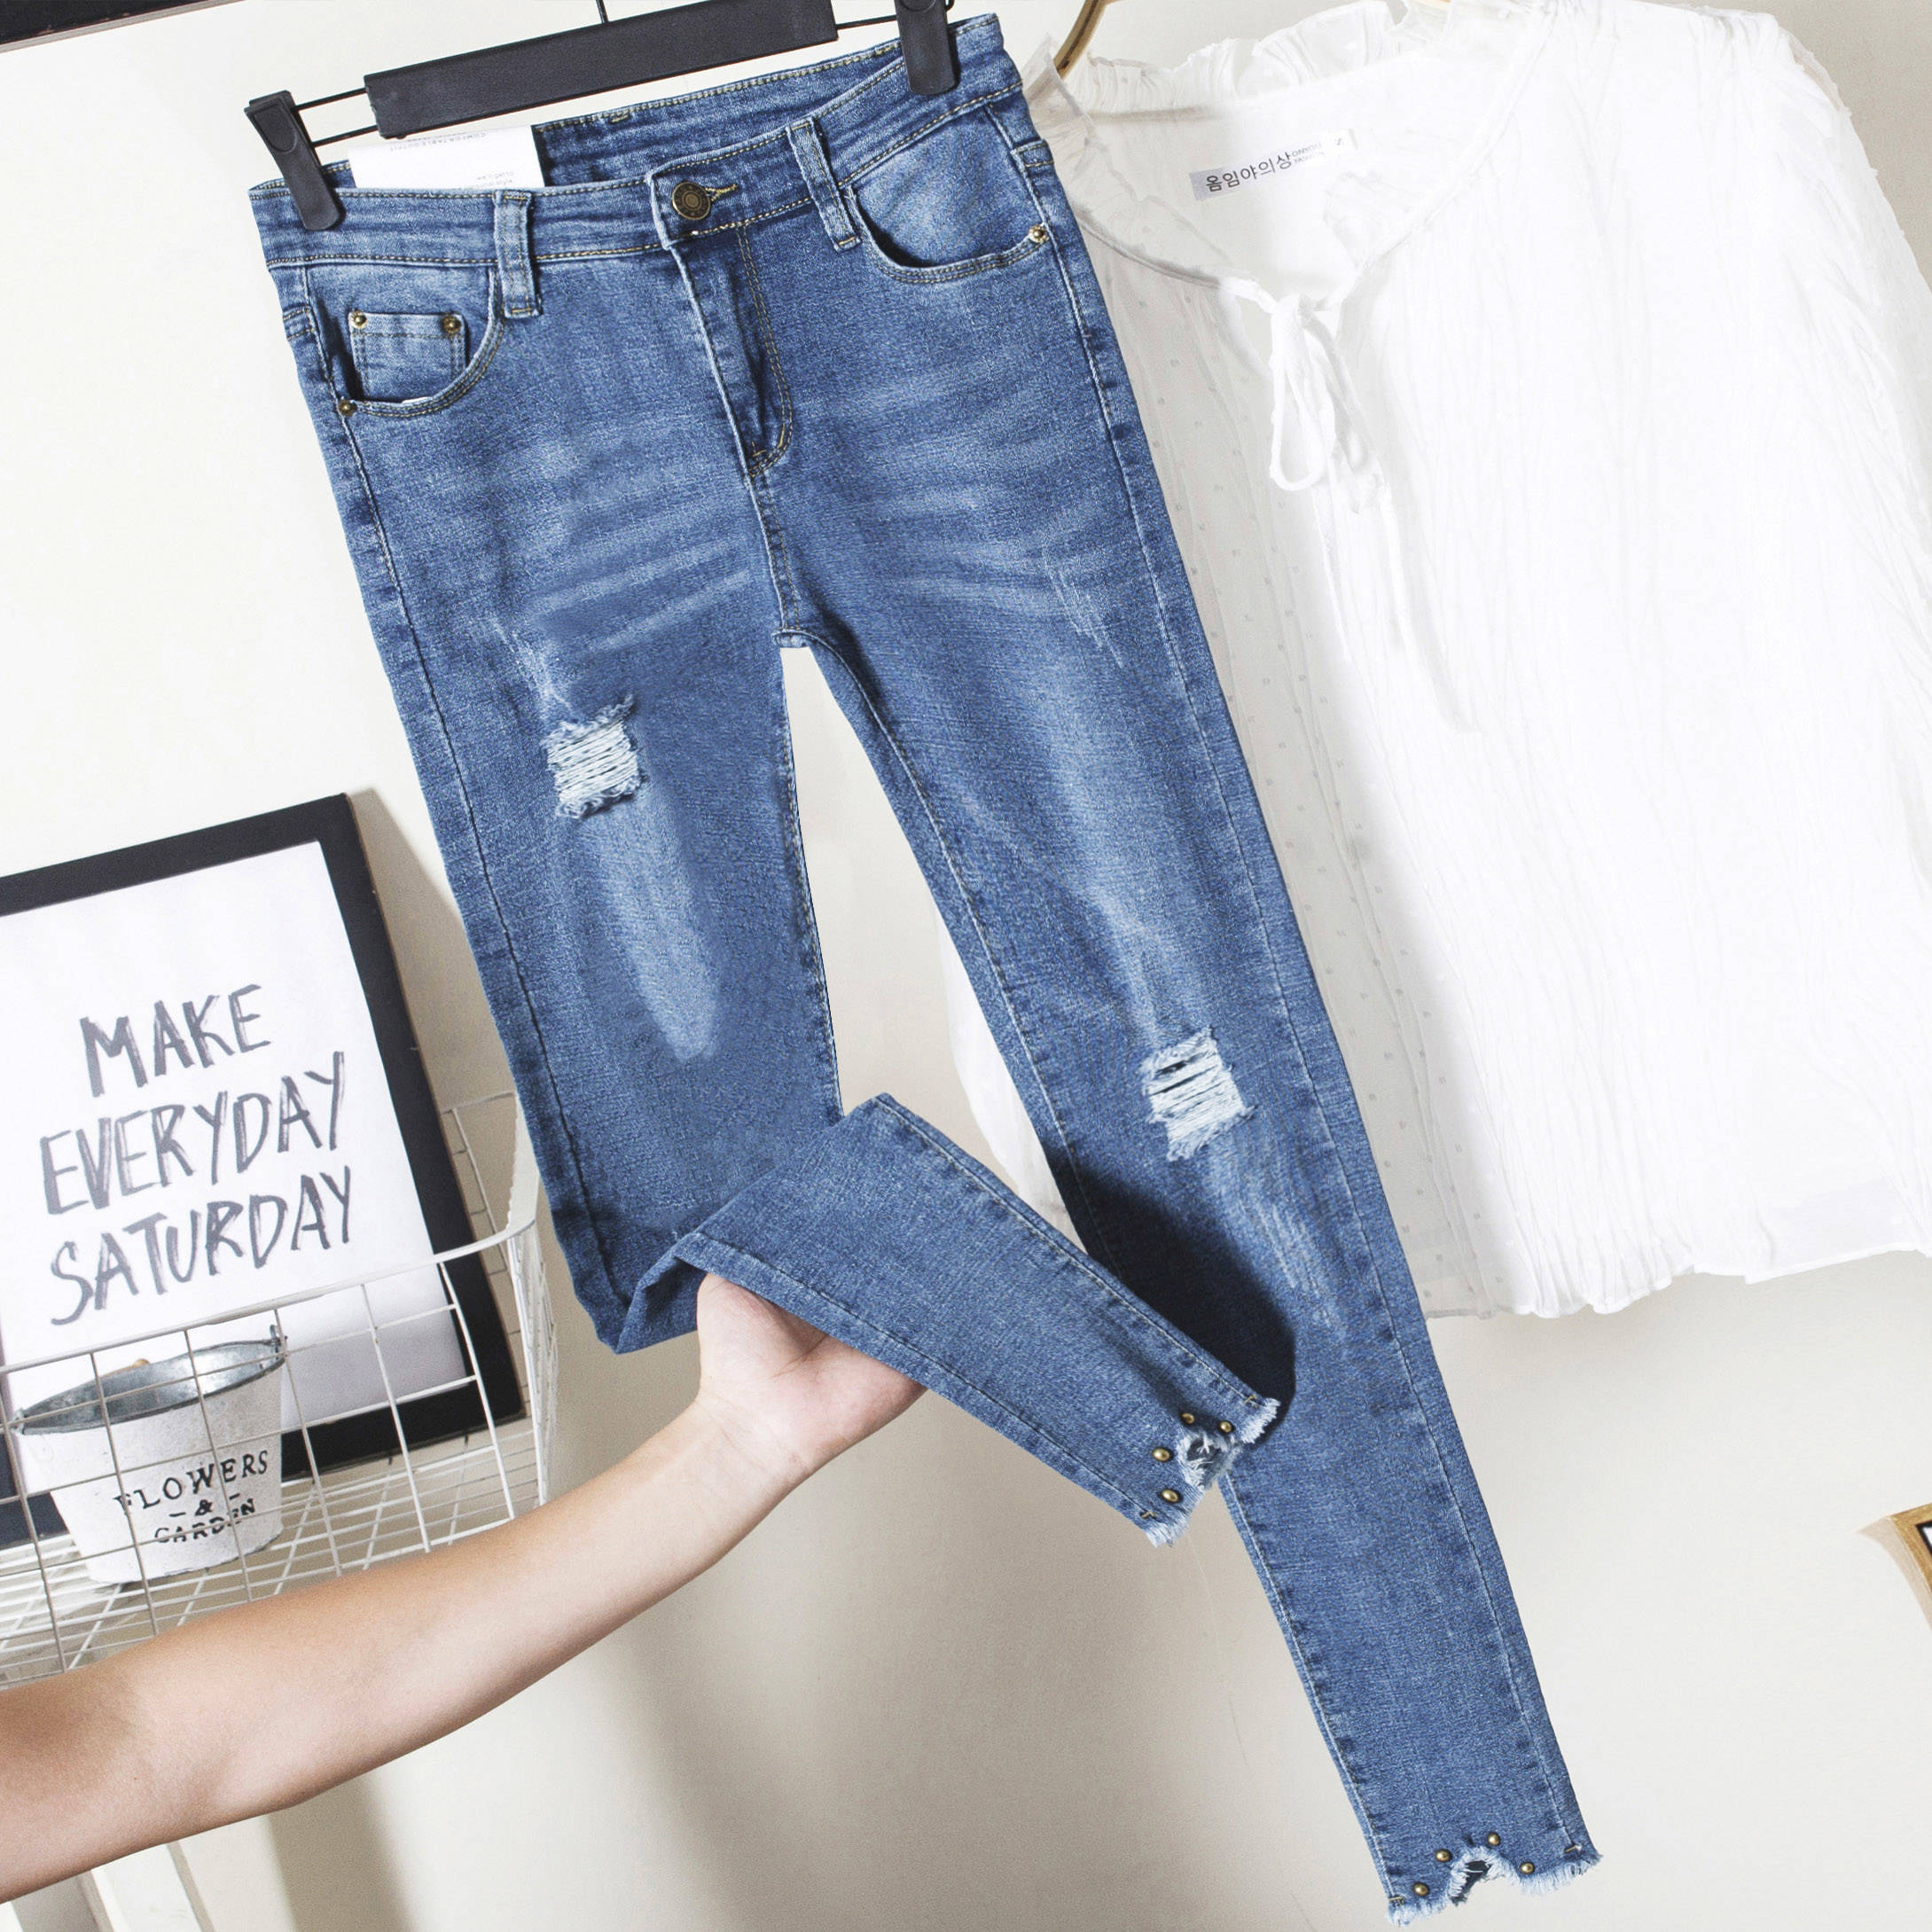 Spring Slim Women Jeans Female Denim Pants Black Stretch  Pencil Blue Skinny Pants For Women Pencil Jeans Trousers